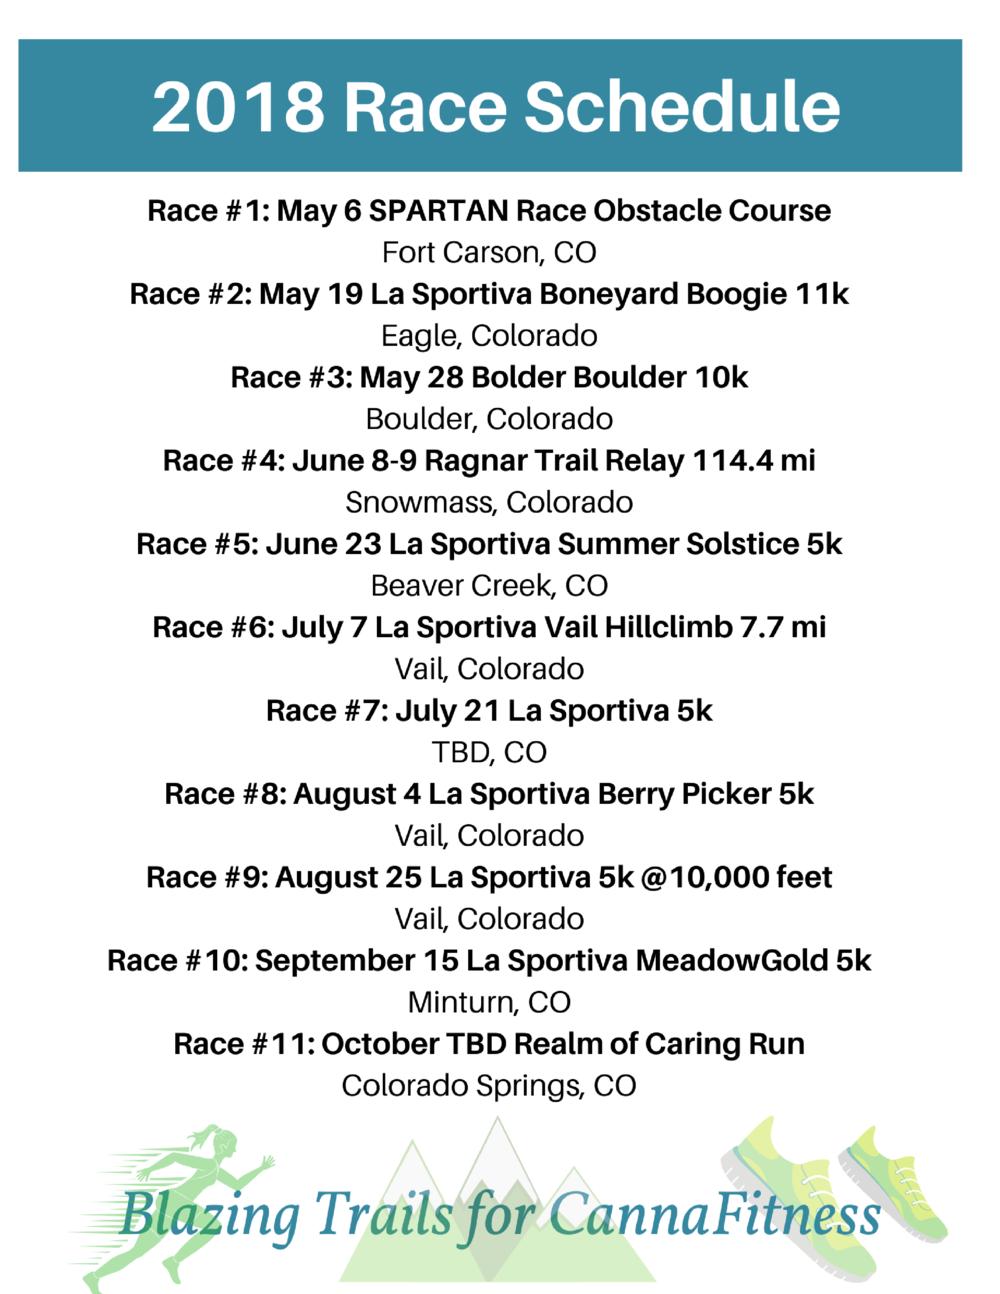 2018 Race Schedule.png